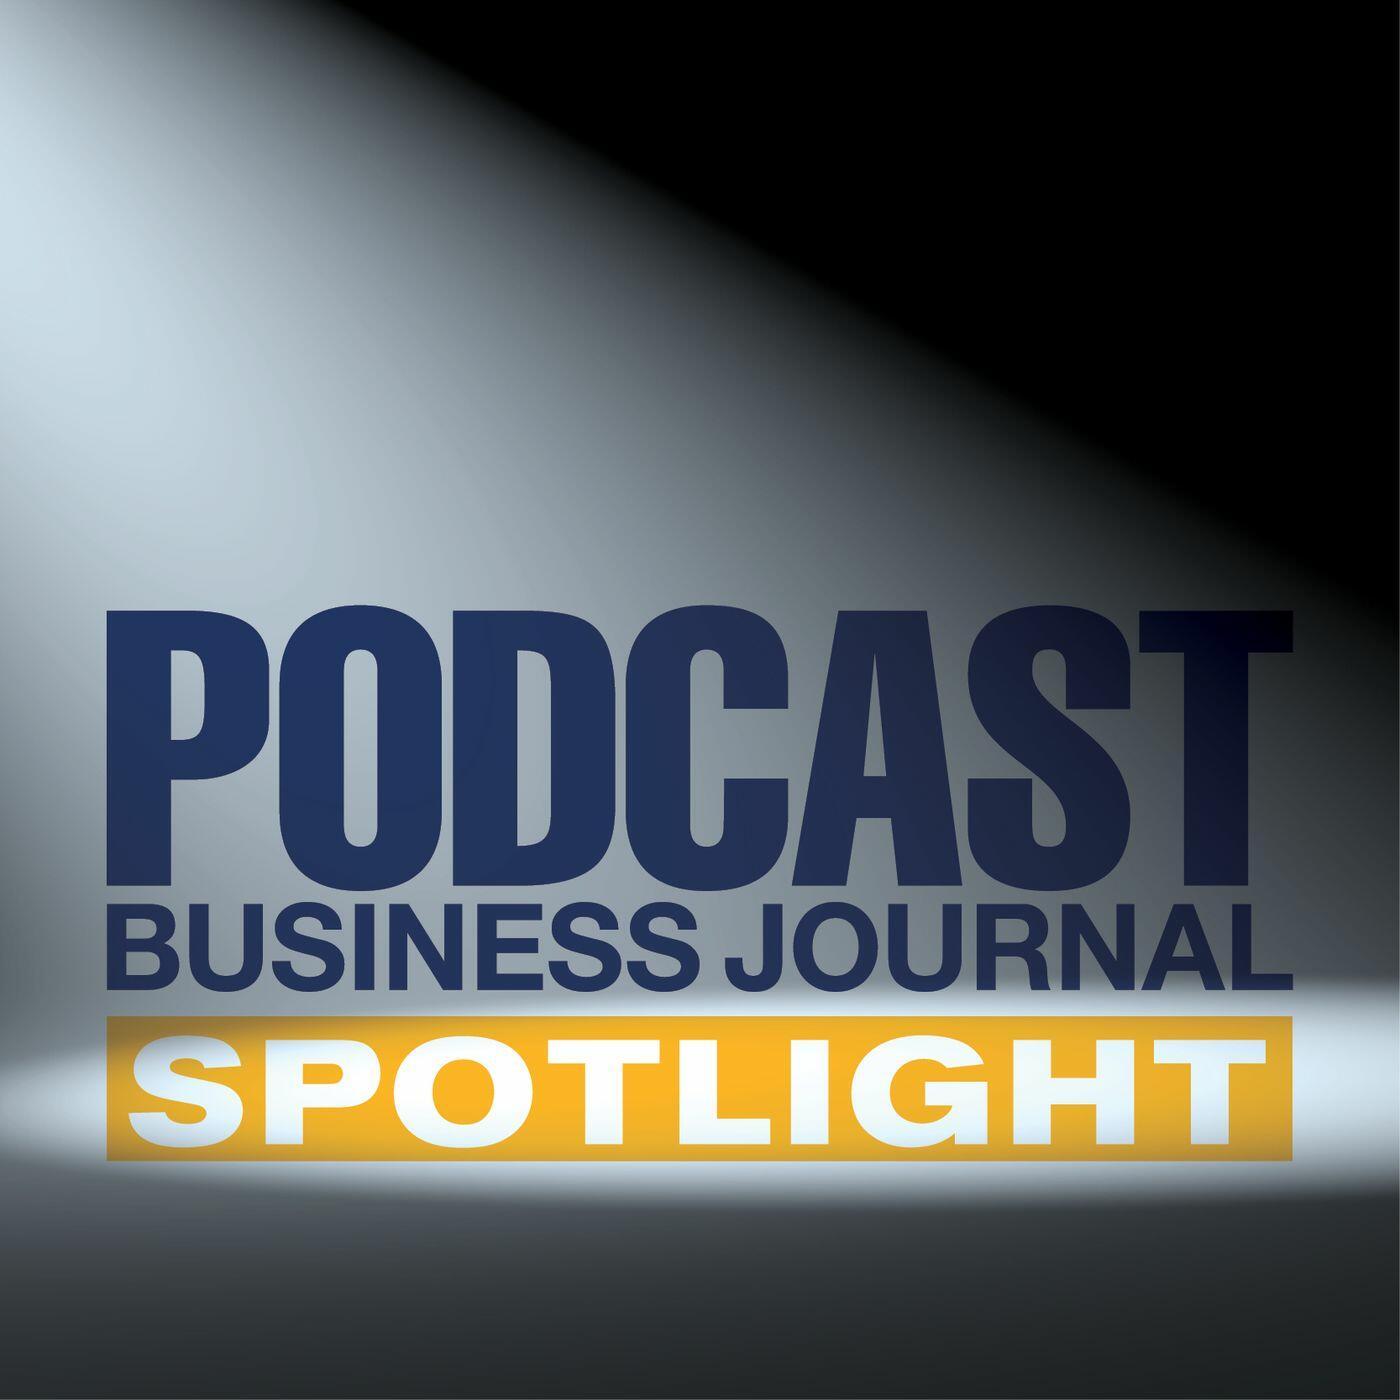 Podcast Business Journal Spotlight